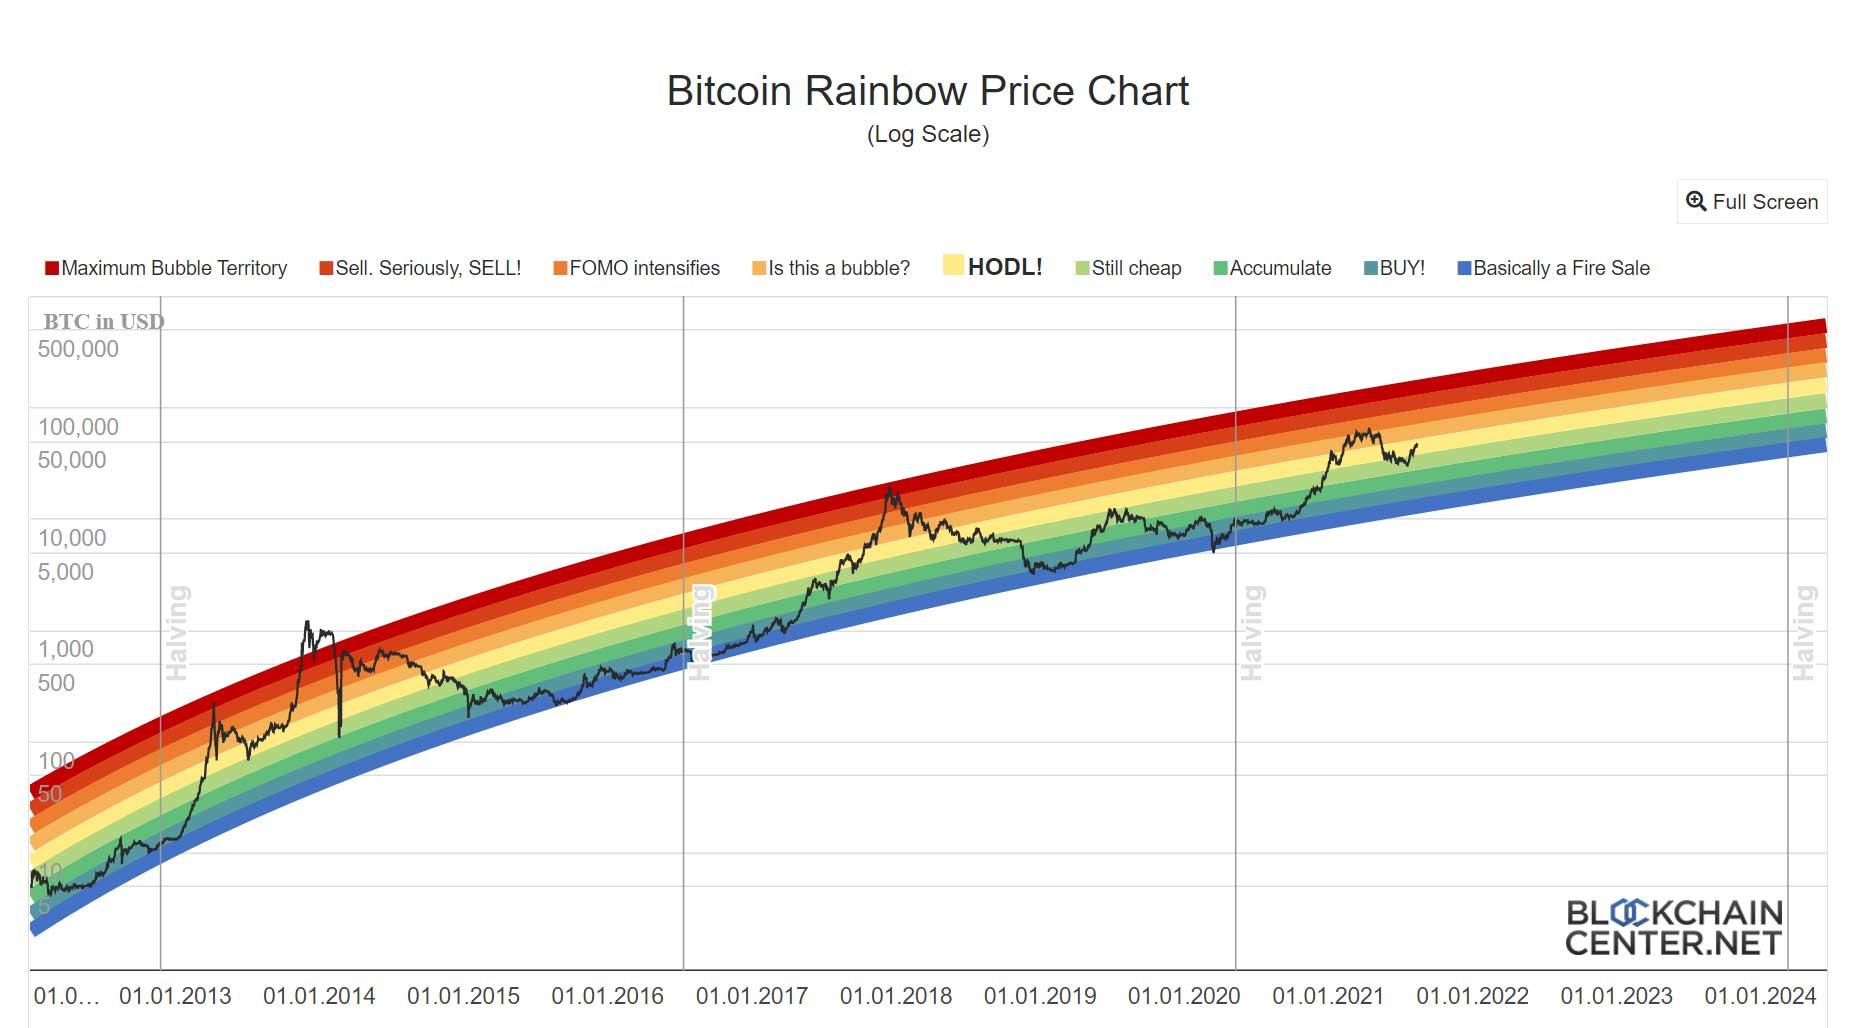 Live Bitcoin Rainbow Price Chart